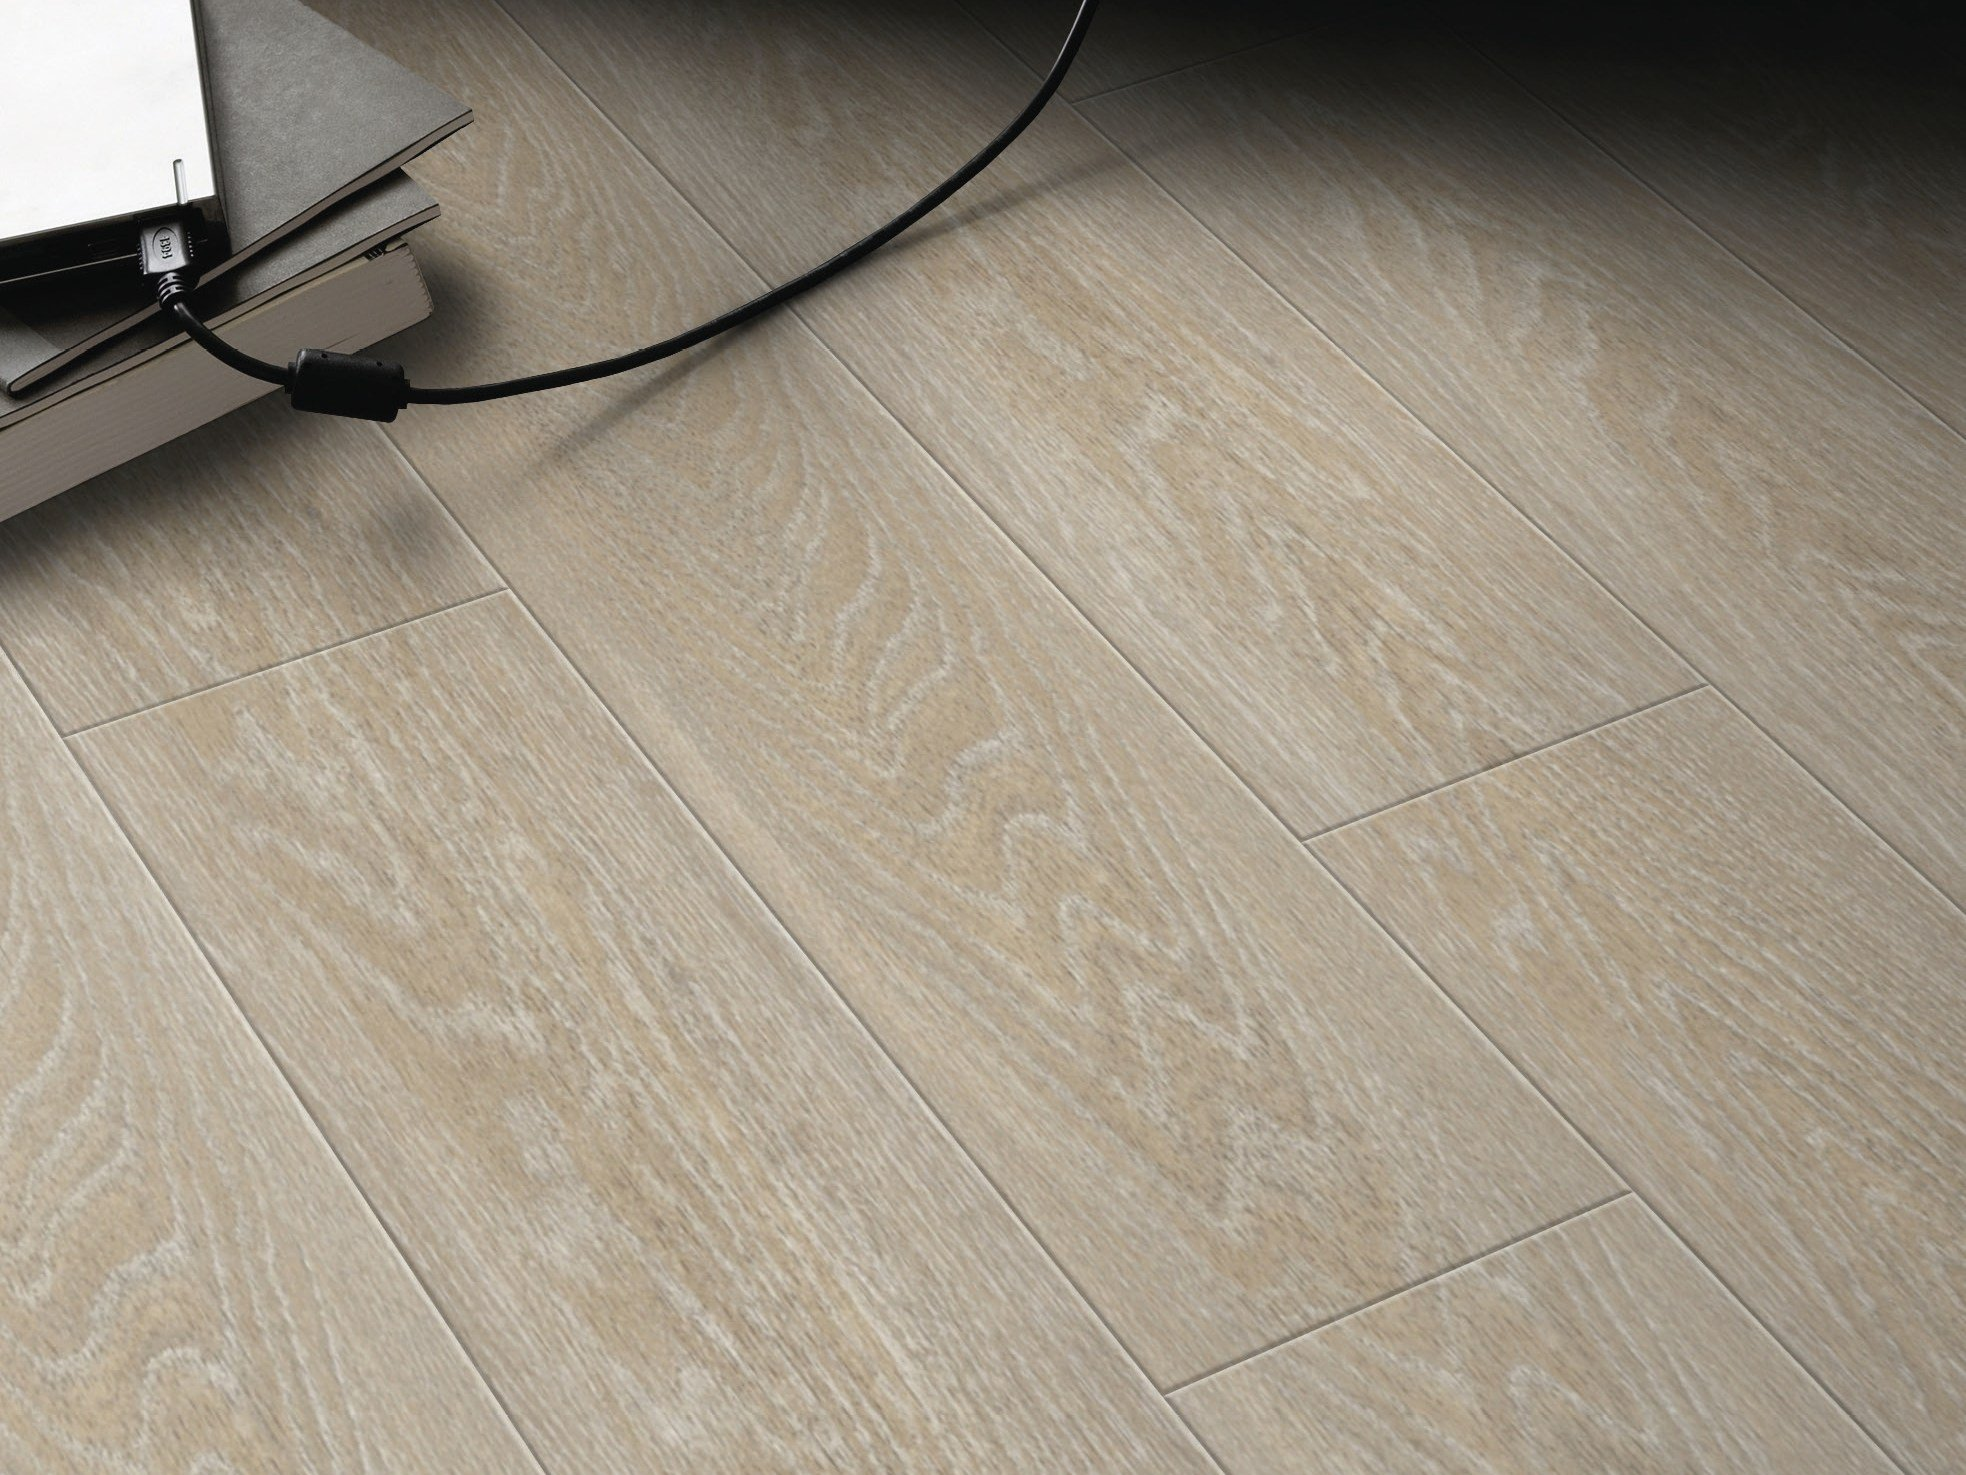 Anti slip floor tiles with wood effect artline wood lvt dryback line by gerflor for Parquet pvc gerflor